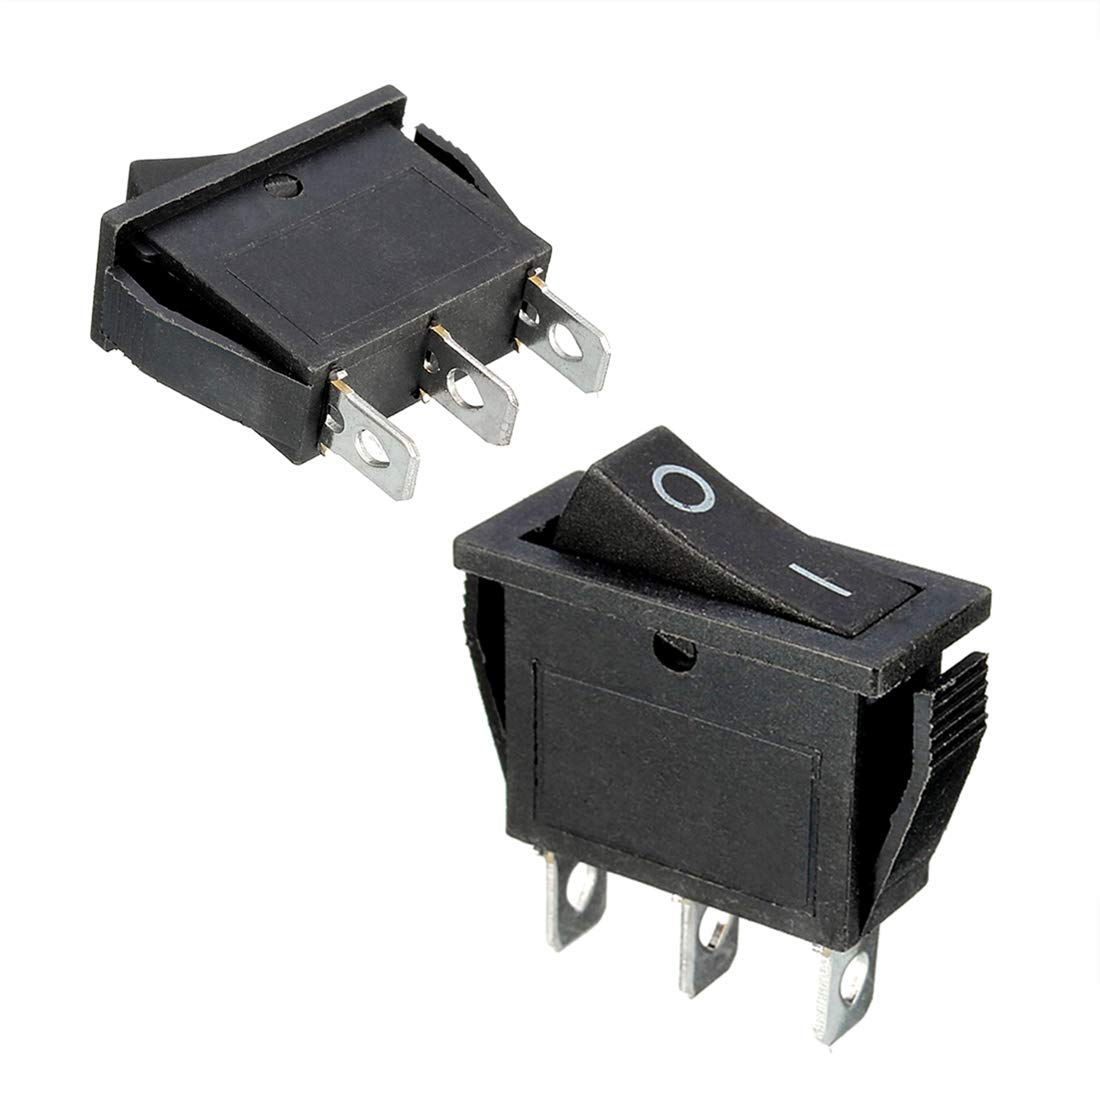 Willwin 10Pcs KCD3-3P Green Illuminated Light 3Pin SPST On//Off Rocker Switch AC 16A//250V 20A//125V